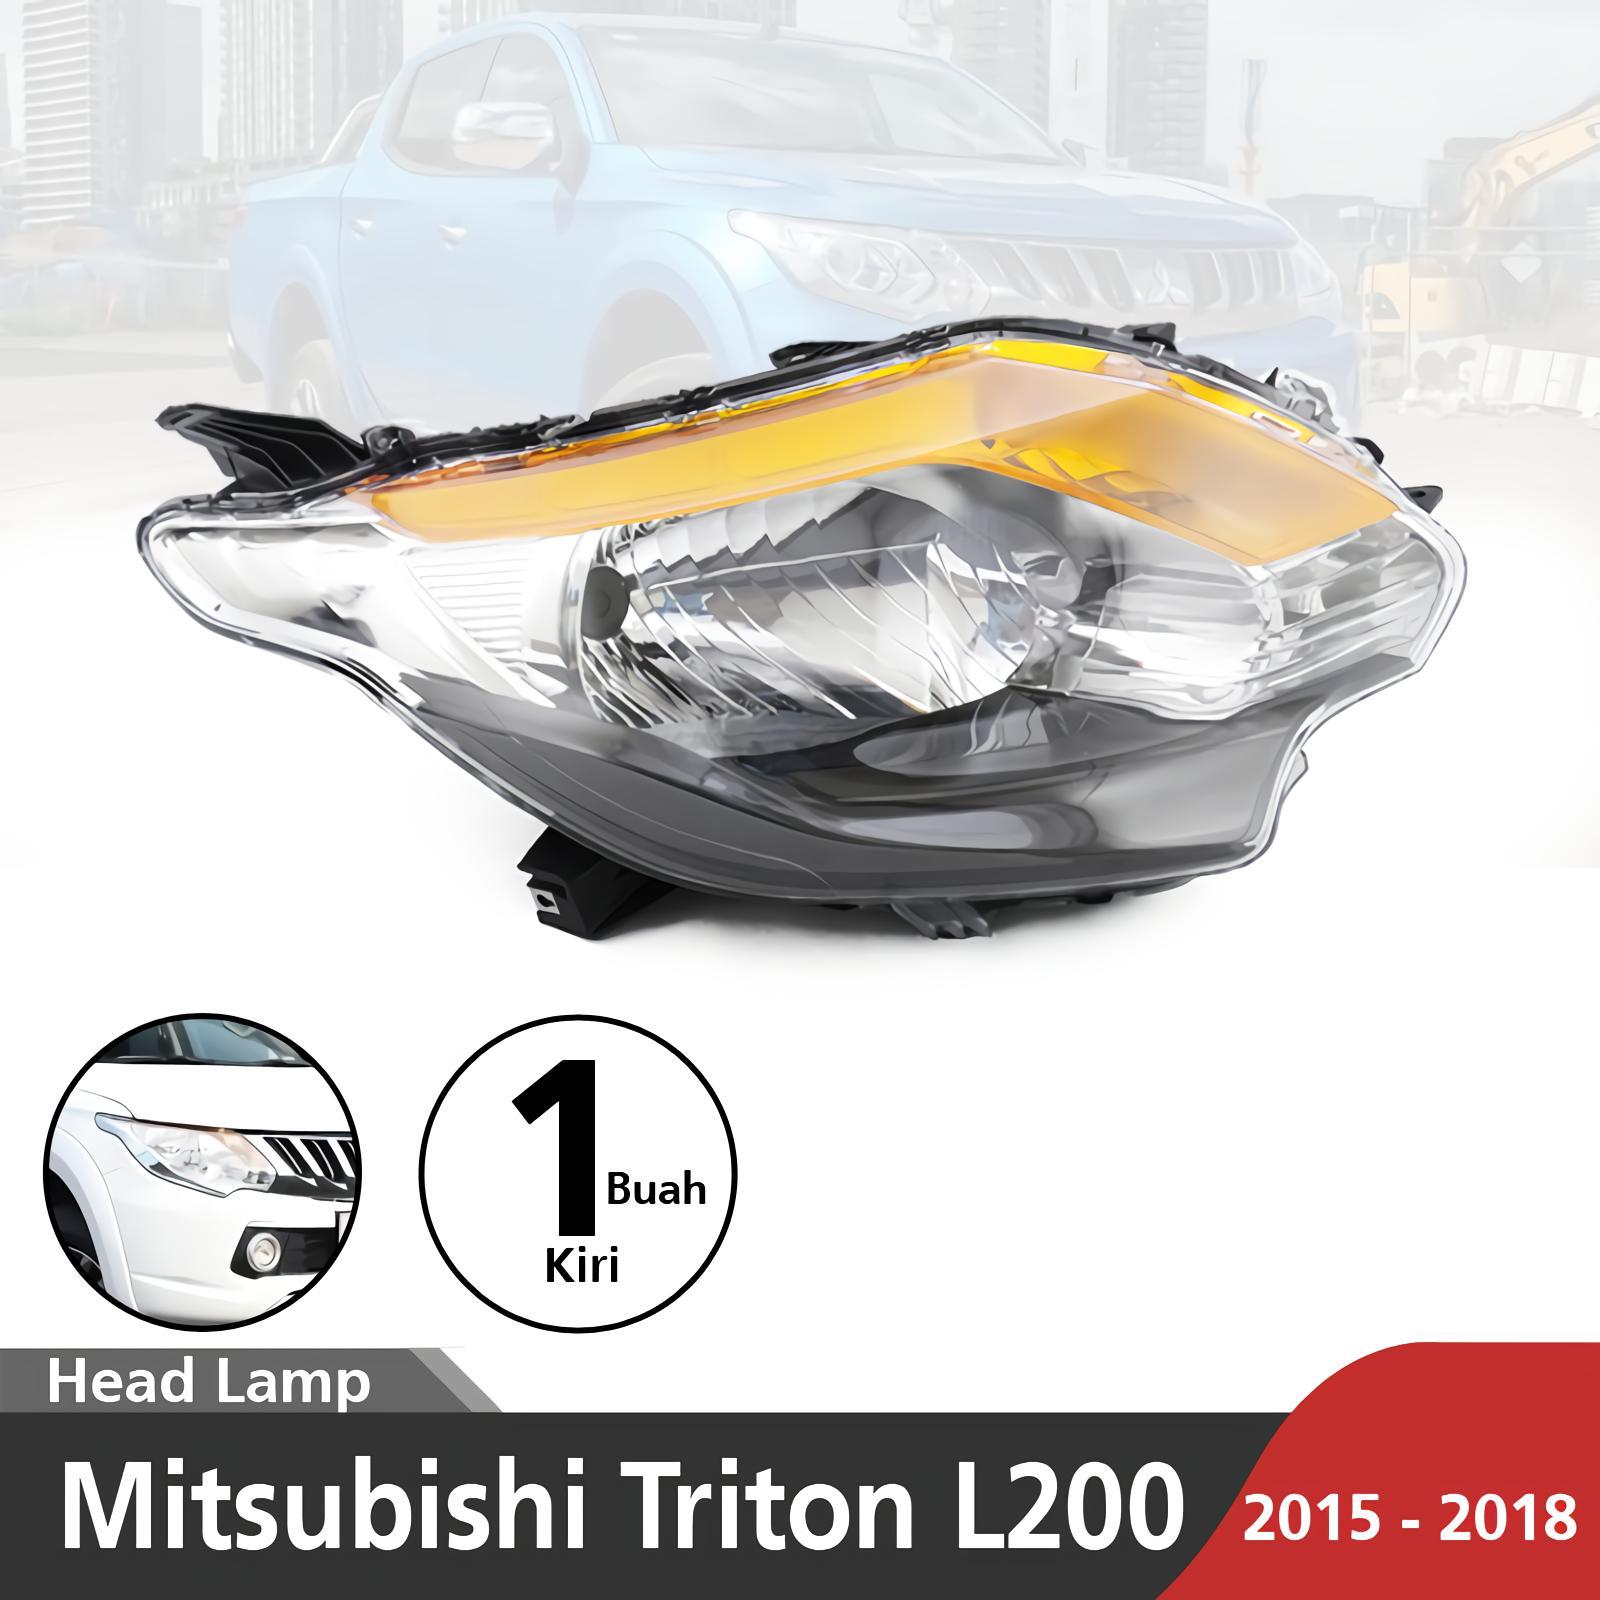 Lampu depan / Headlamp Halogen / Led Mitsubishi Triton L200 2015-2018 Front Headlight Triton Exceed SU-JL22-002-1-LH Kiri